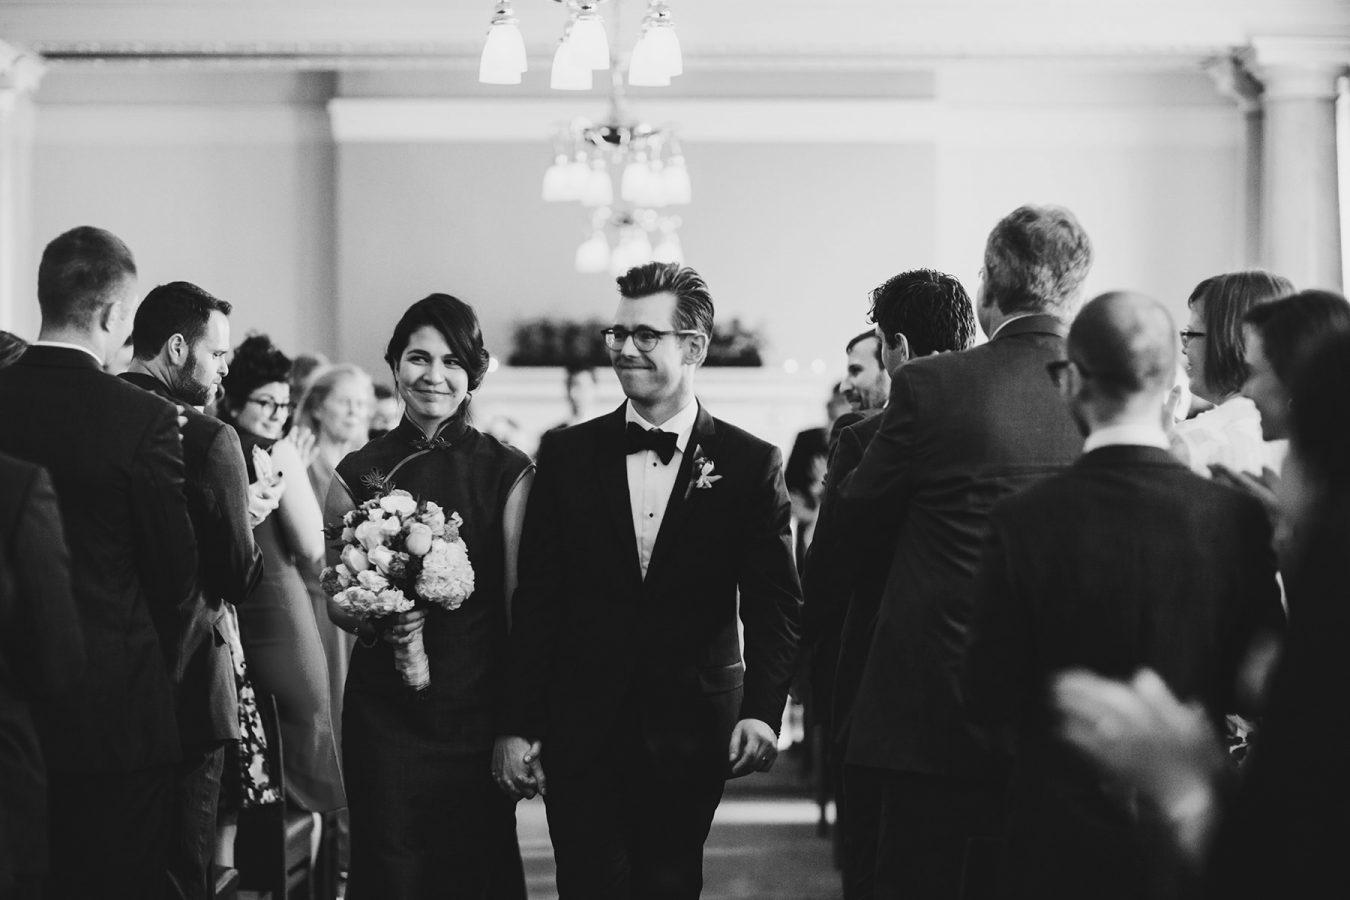 vancouver club wedding, lucida photography, green and gold wedding, moda wedding professionals, melia sorenson